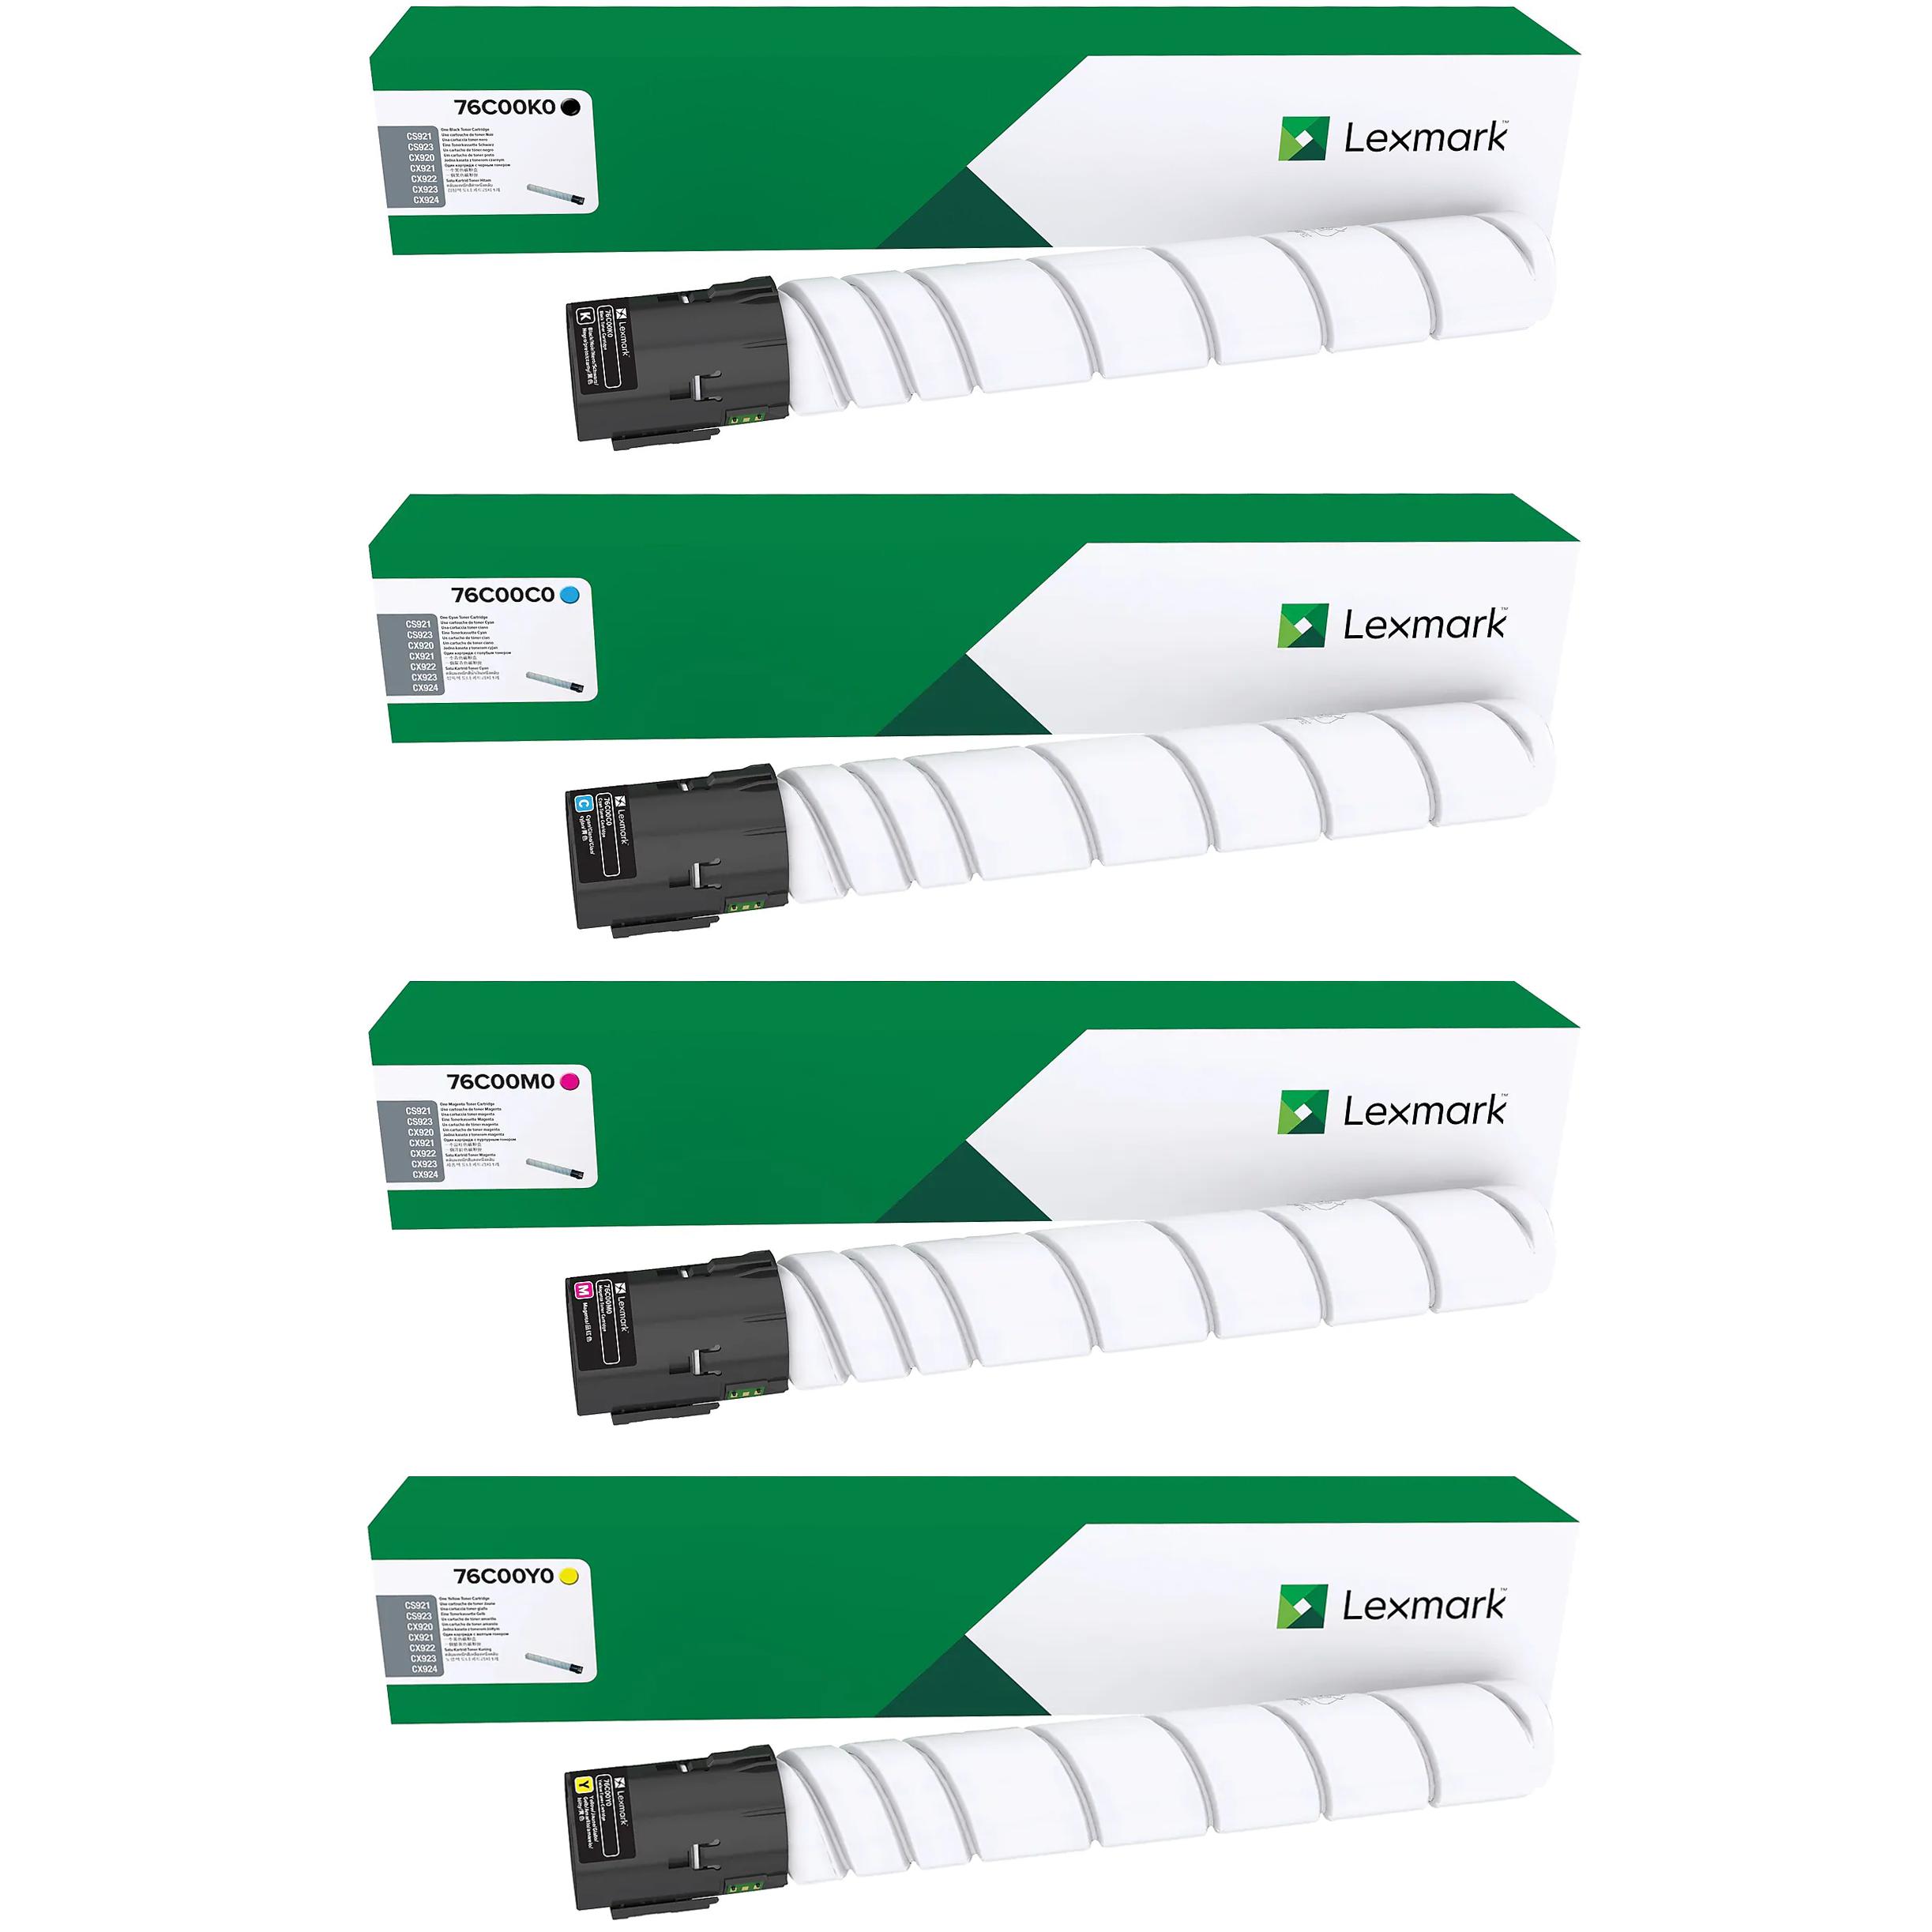 Lexmark CS921 Set | 76C00C0 76C00K0 76C00M0 76C00Y0 | Original Lexmark Toner Cartridges – Black, Cyan, Magenta, Yellow